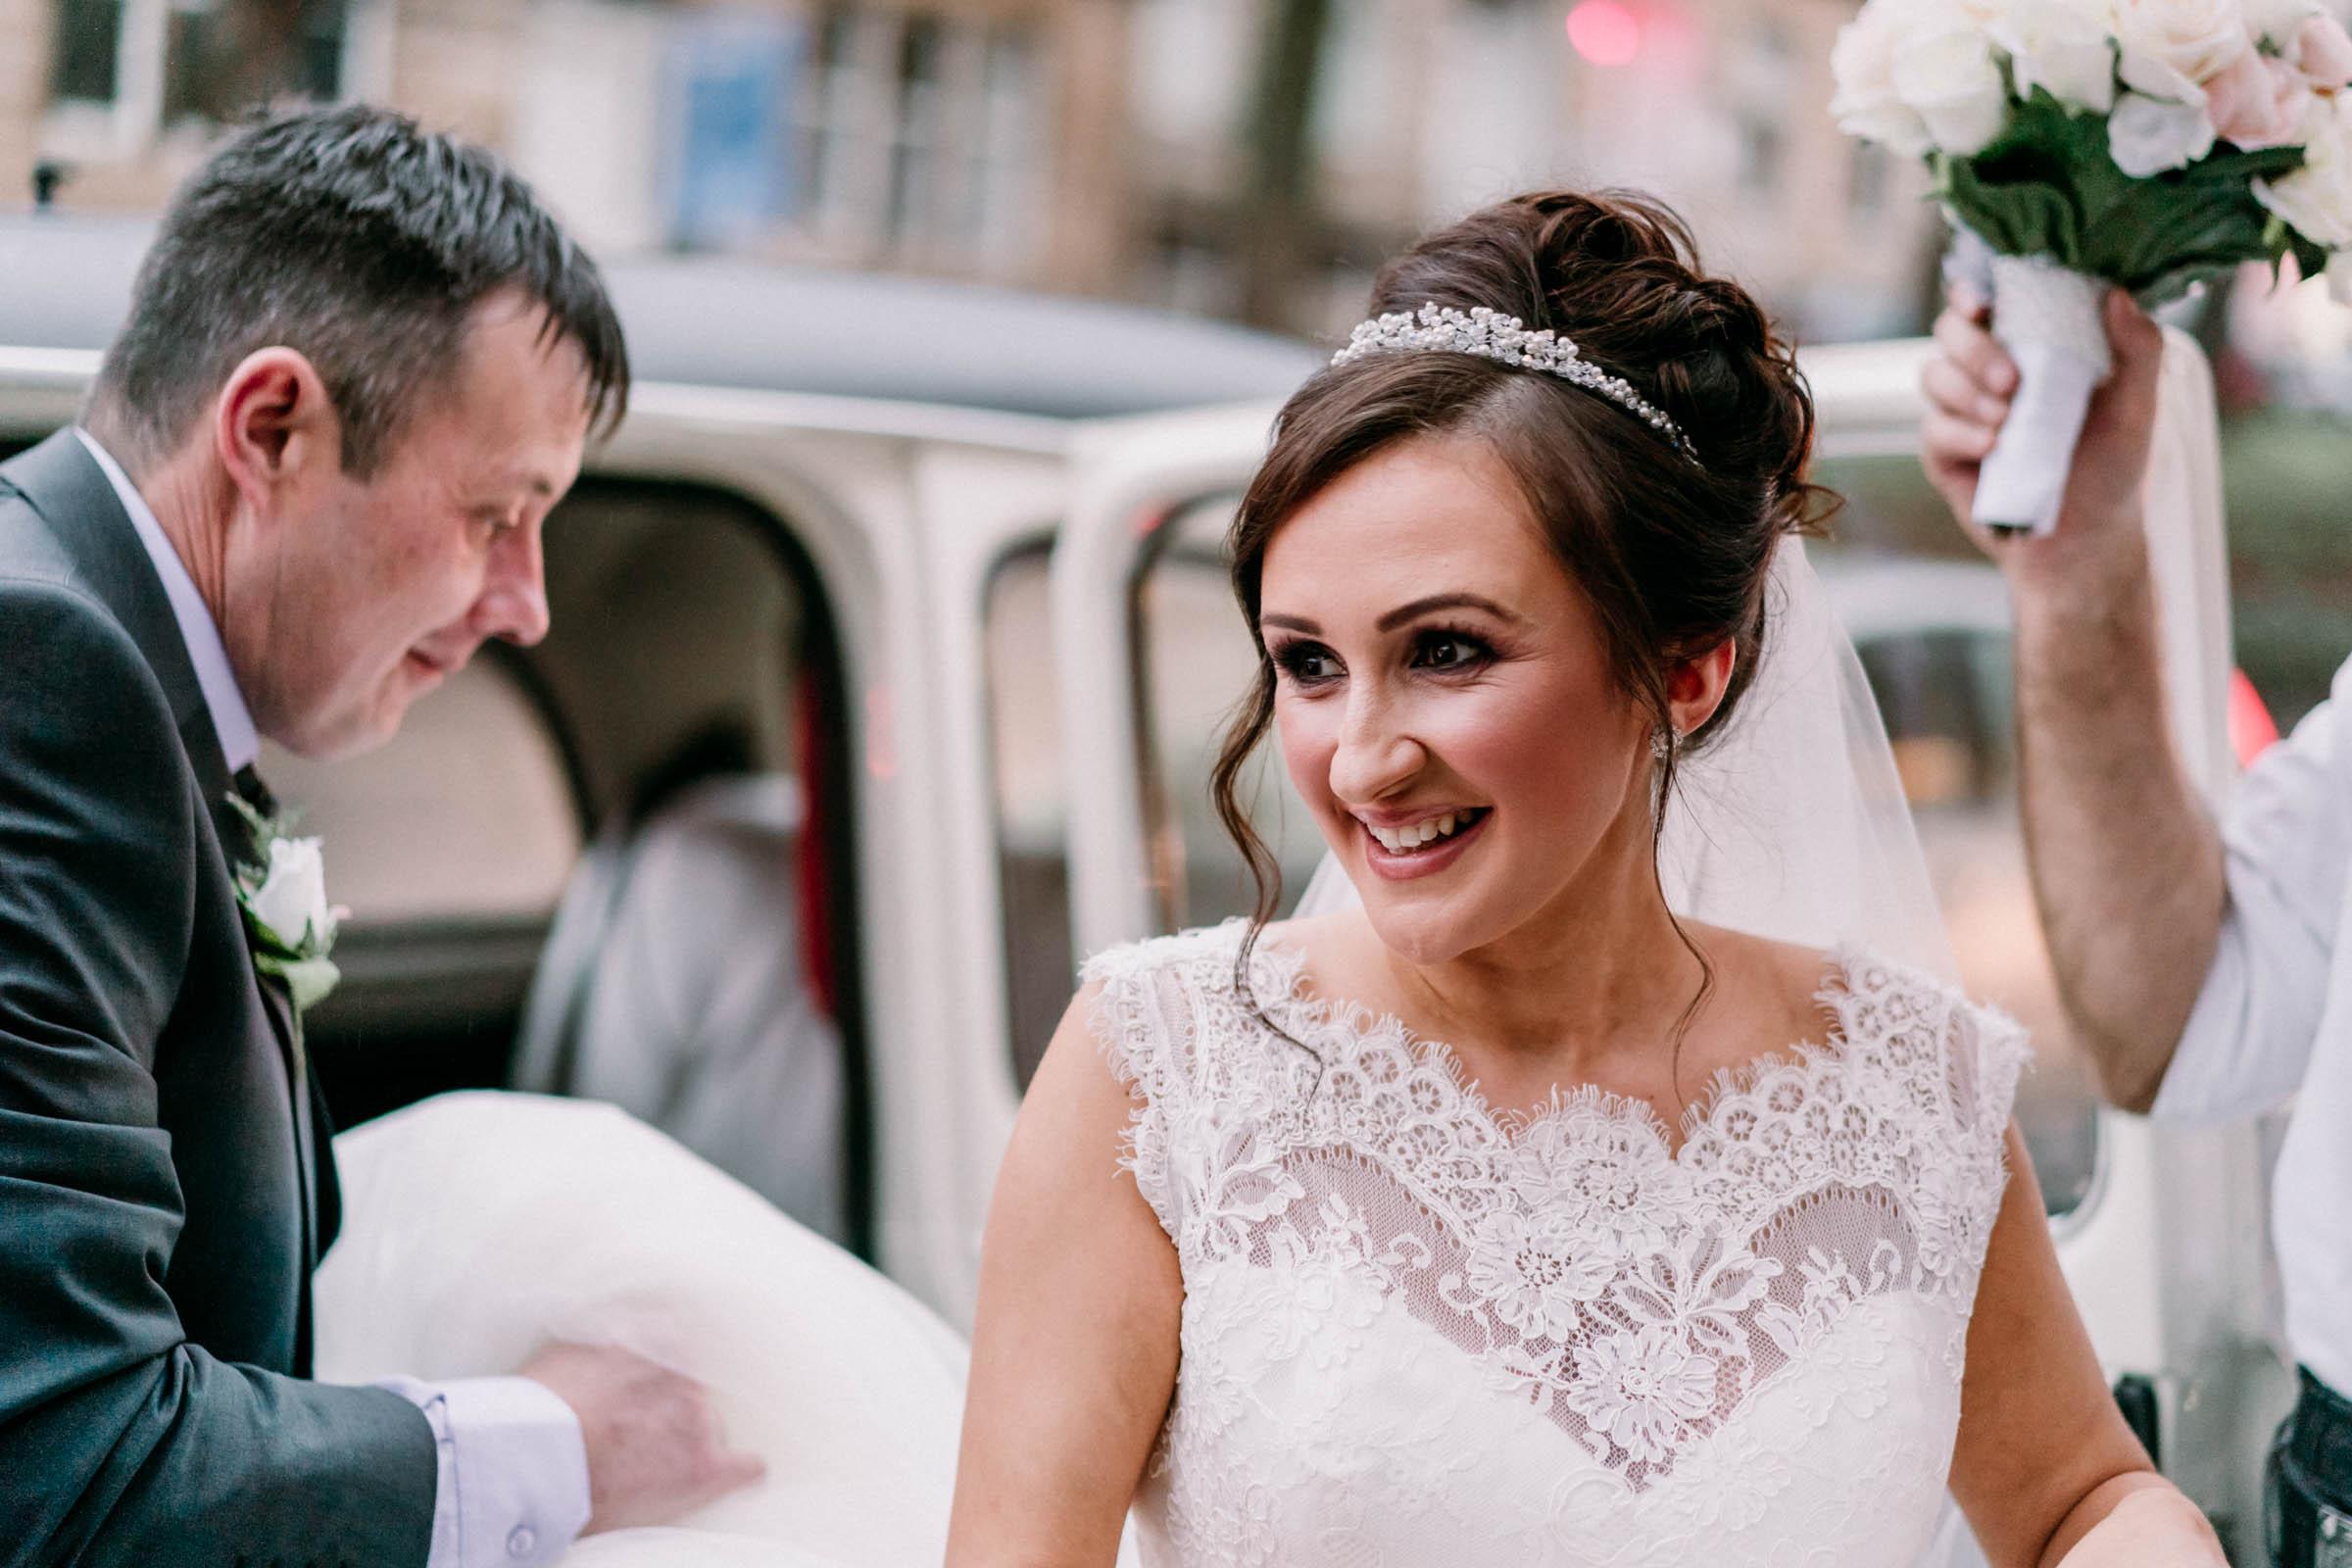 Oran-Mor-Wedding-Photographer-DearlyPhotography (12 of 55).jpg